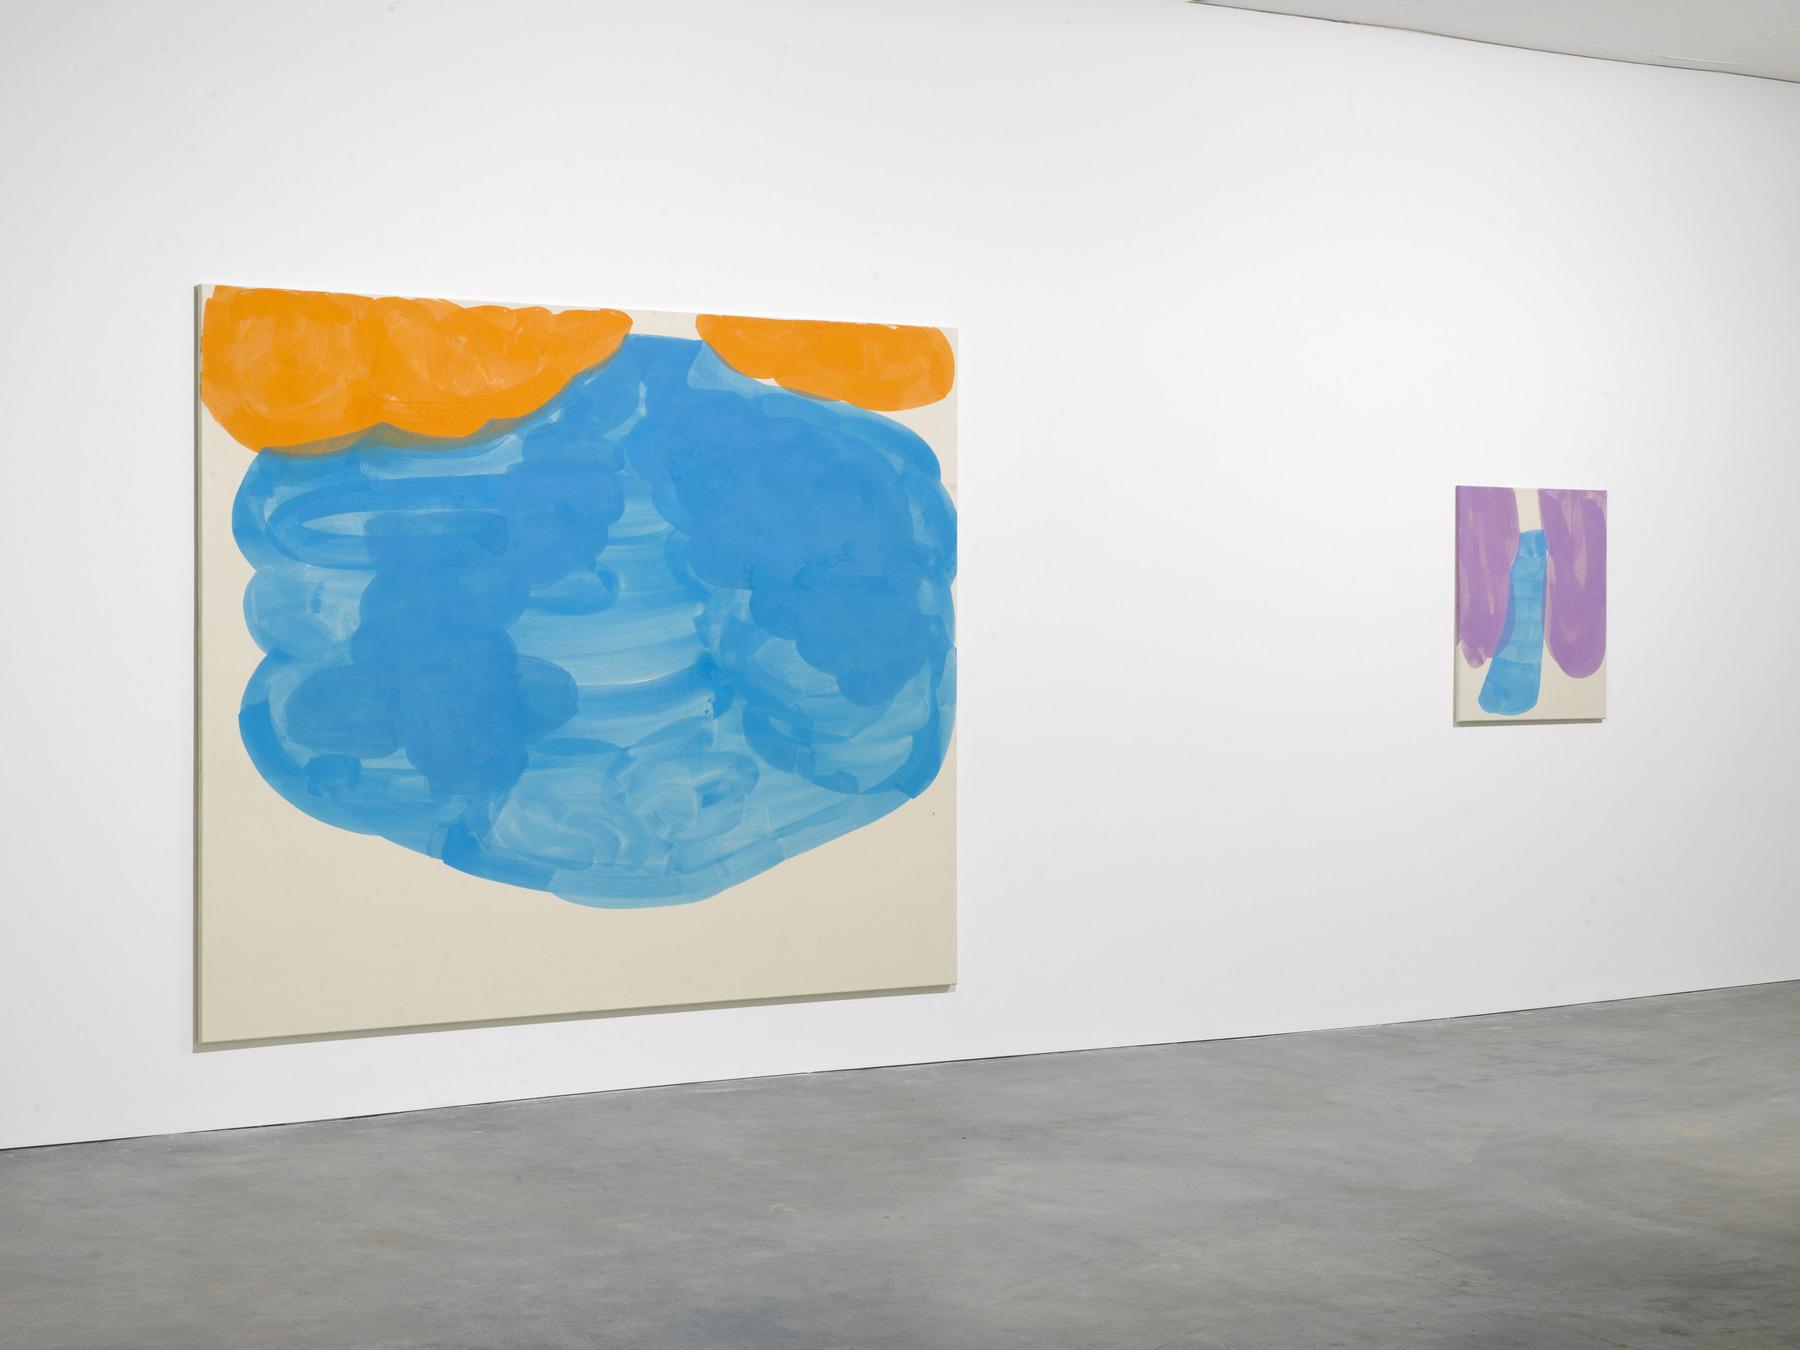 Tamina Amadyar_10,000 hours_Galerie Guido W. Baudach, Berlin_08